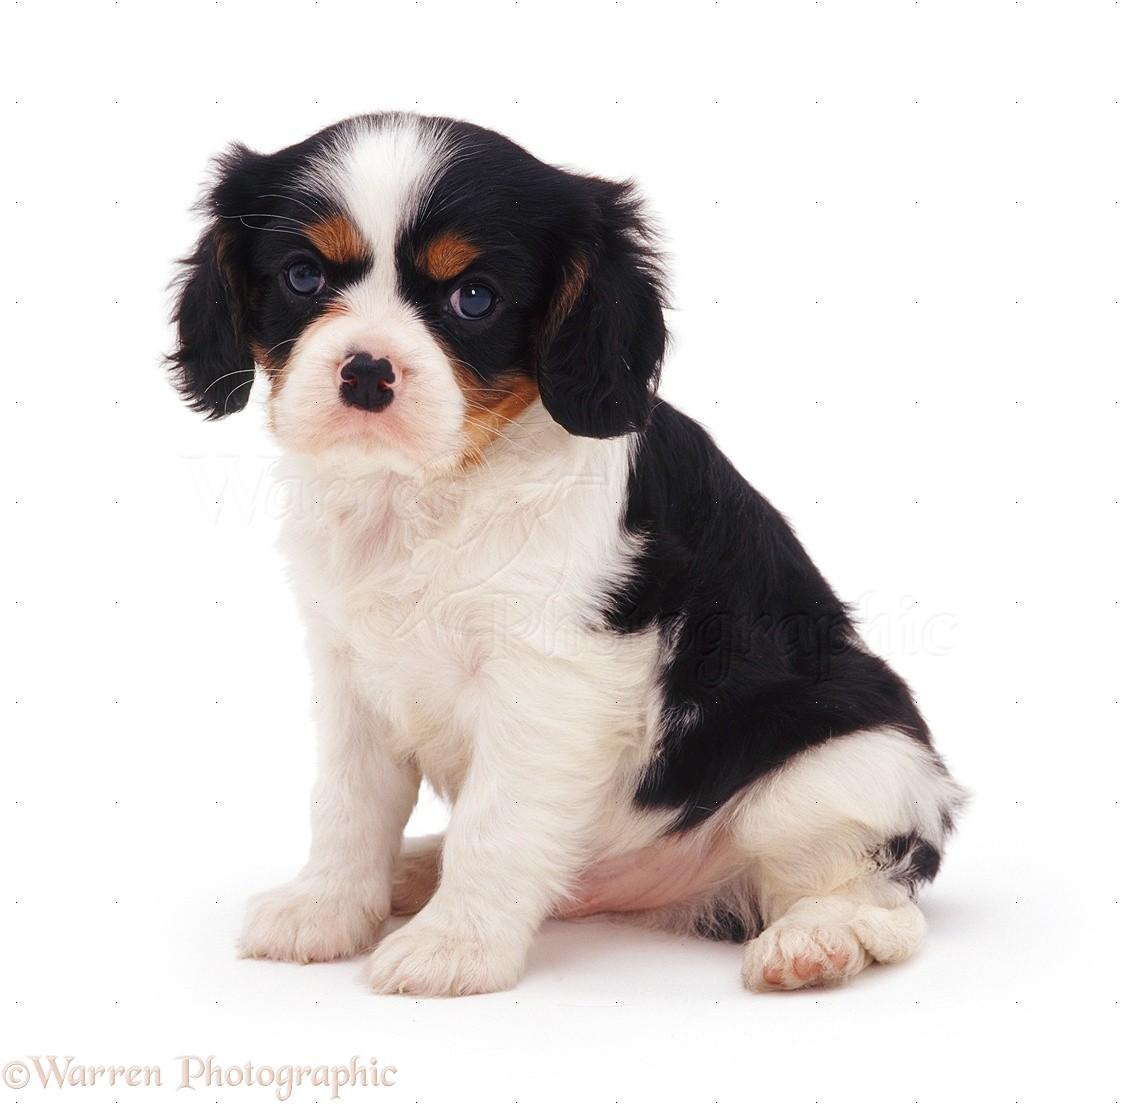 Dog Cavalier King Charles Spaniel Pup Photo Wp07524